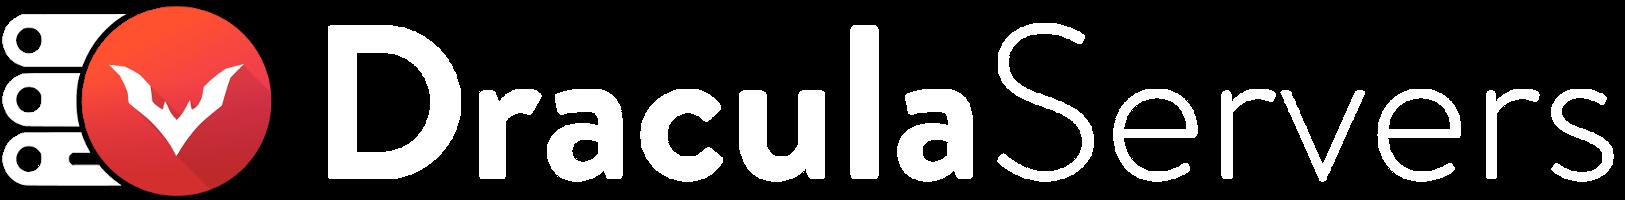 Install and Configure FreeRADIUS on Ubuntu 18 04 with MySQL